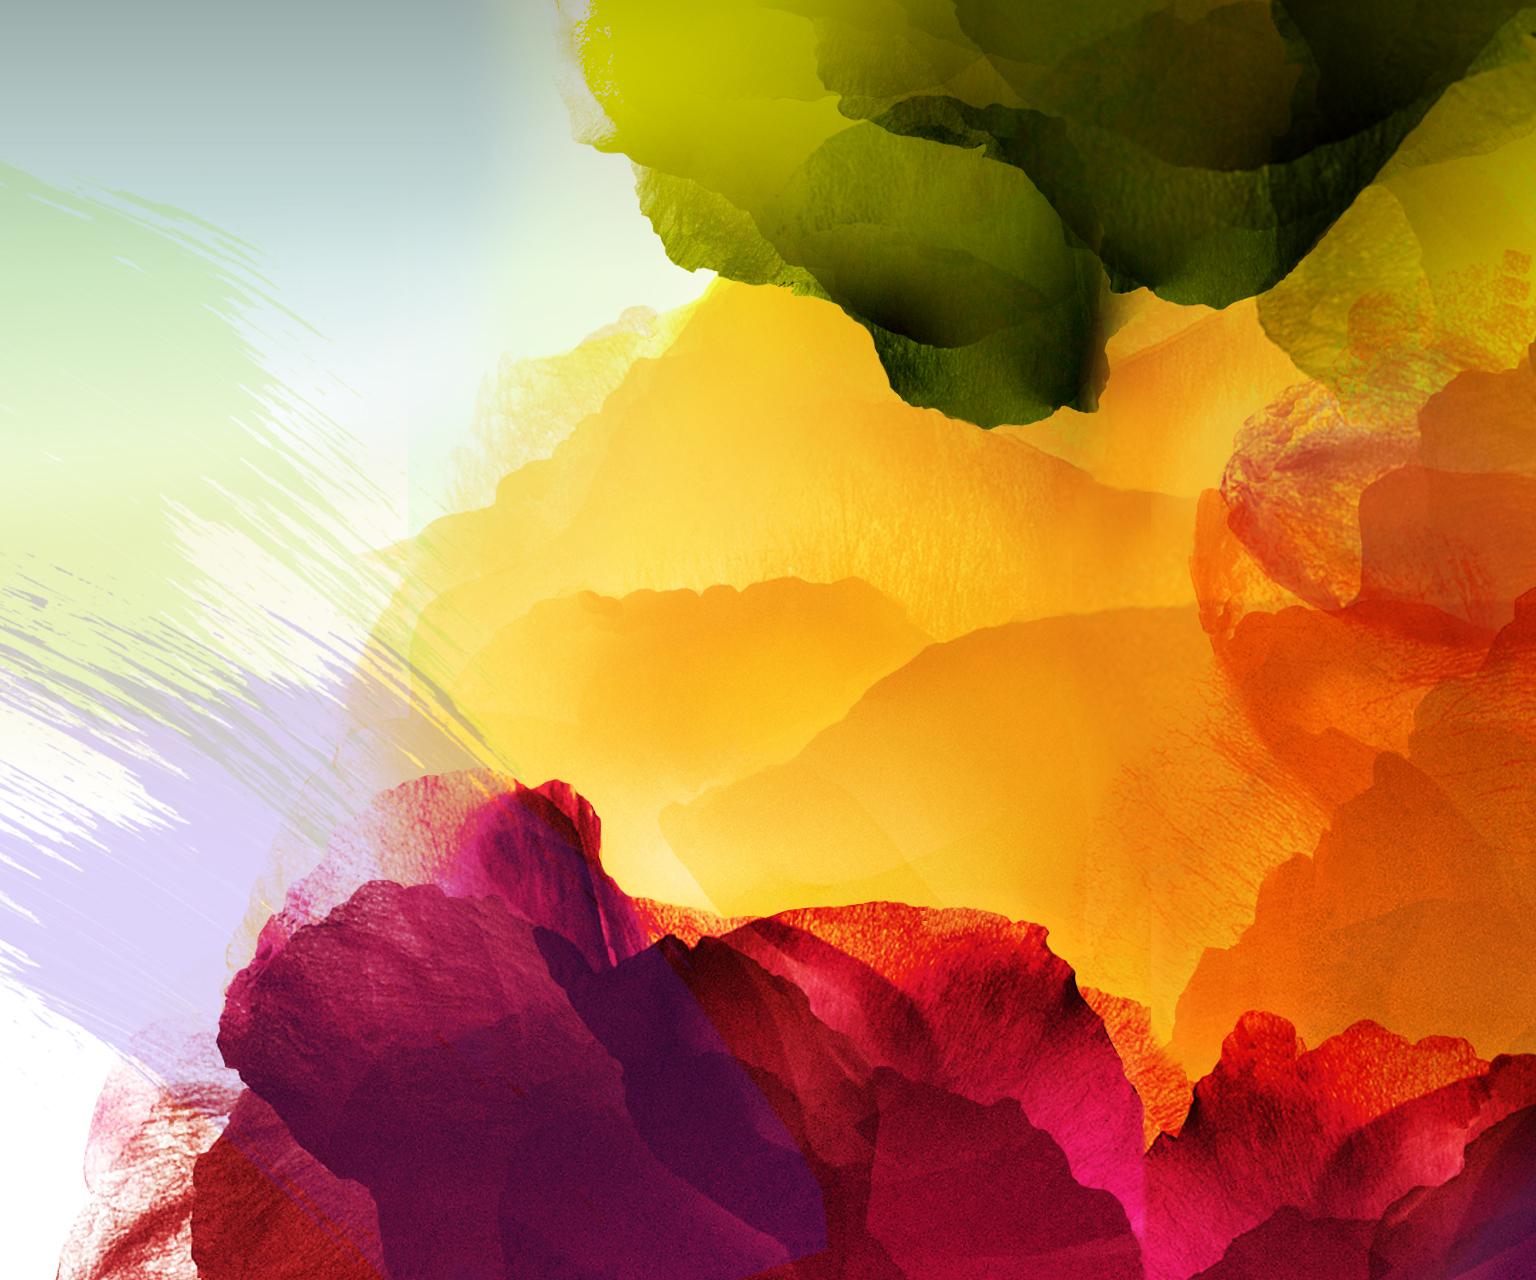 HD Wallpapers - Android, IOS, Windows Phone and Desktop: LG Optimus G Wallpaper